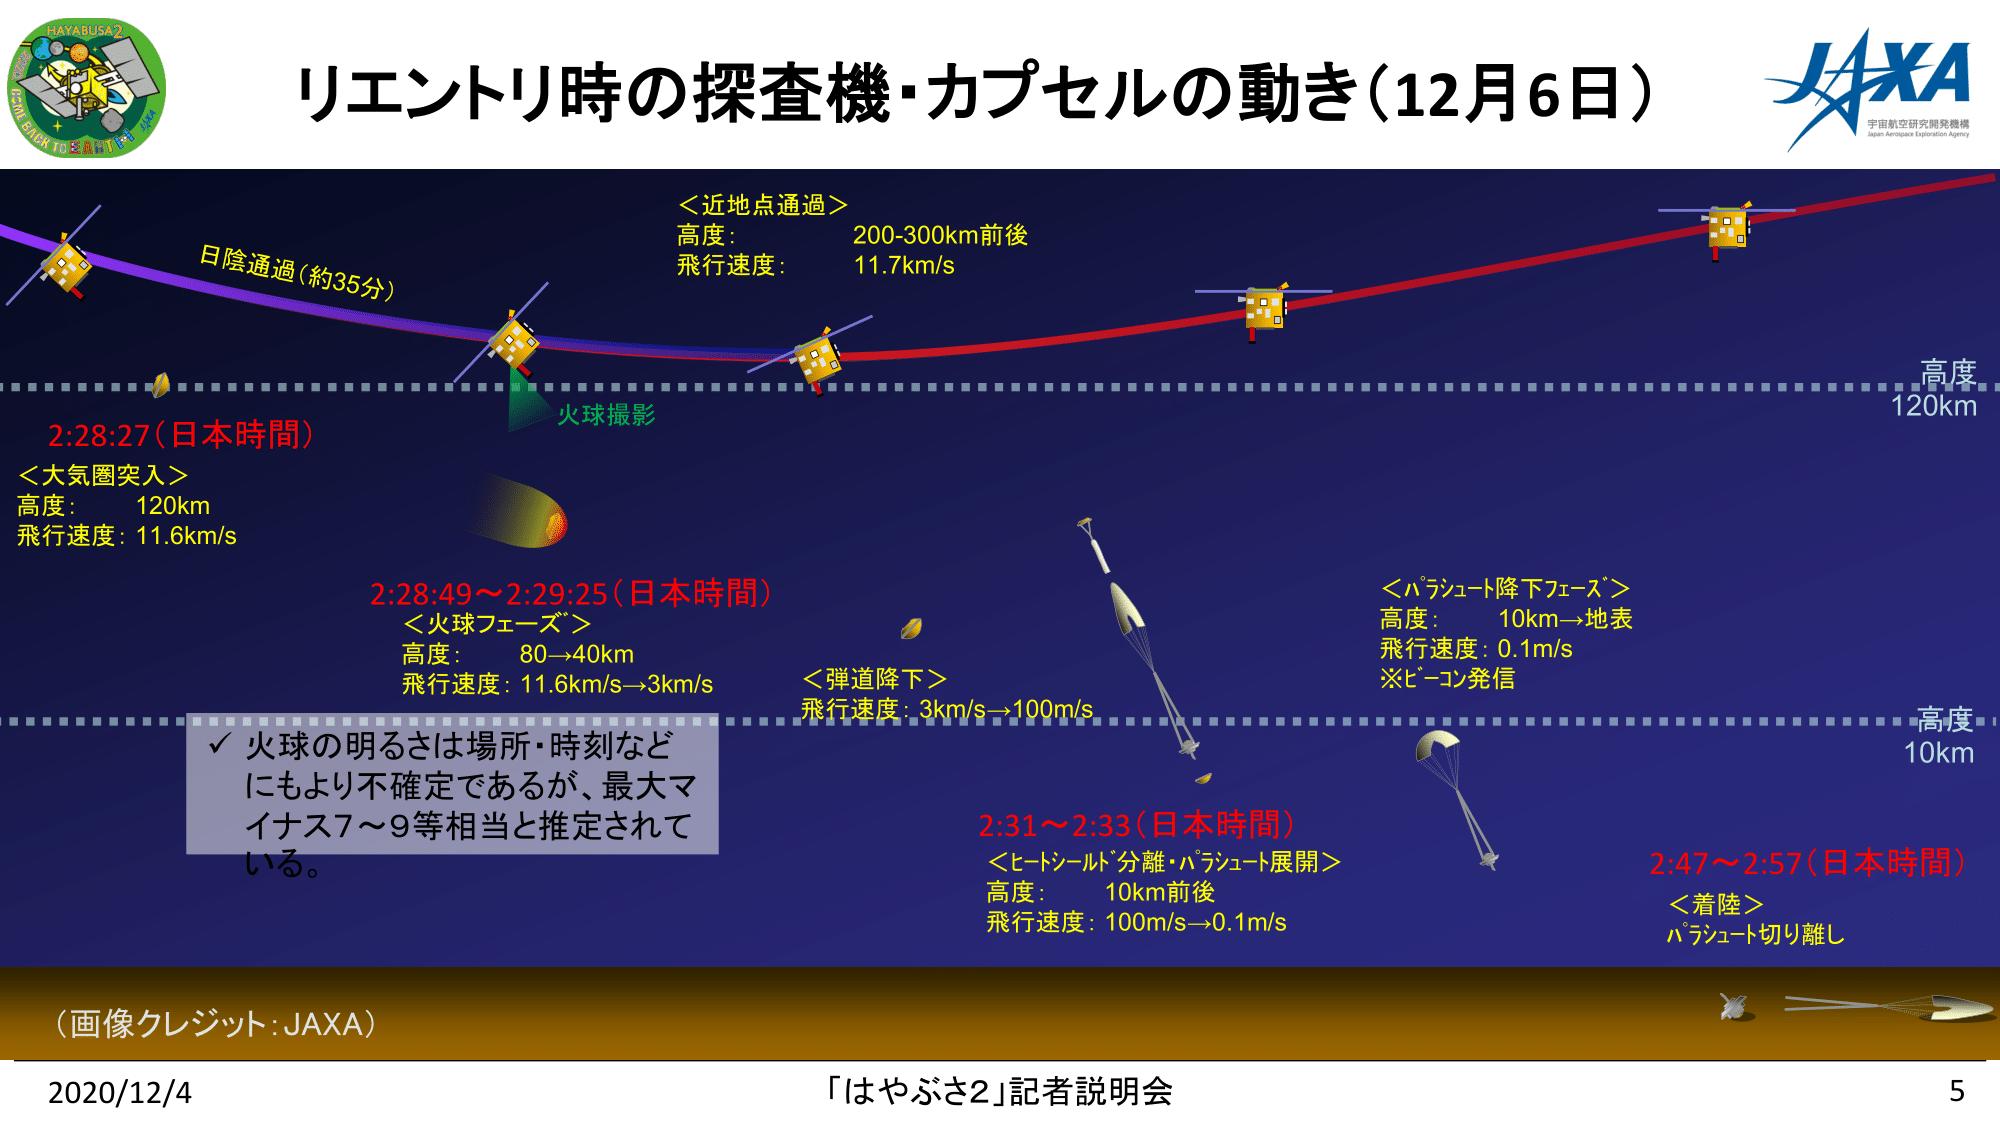 f:id:Imamura:20201204153740p:plain